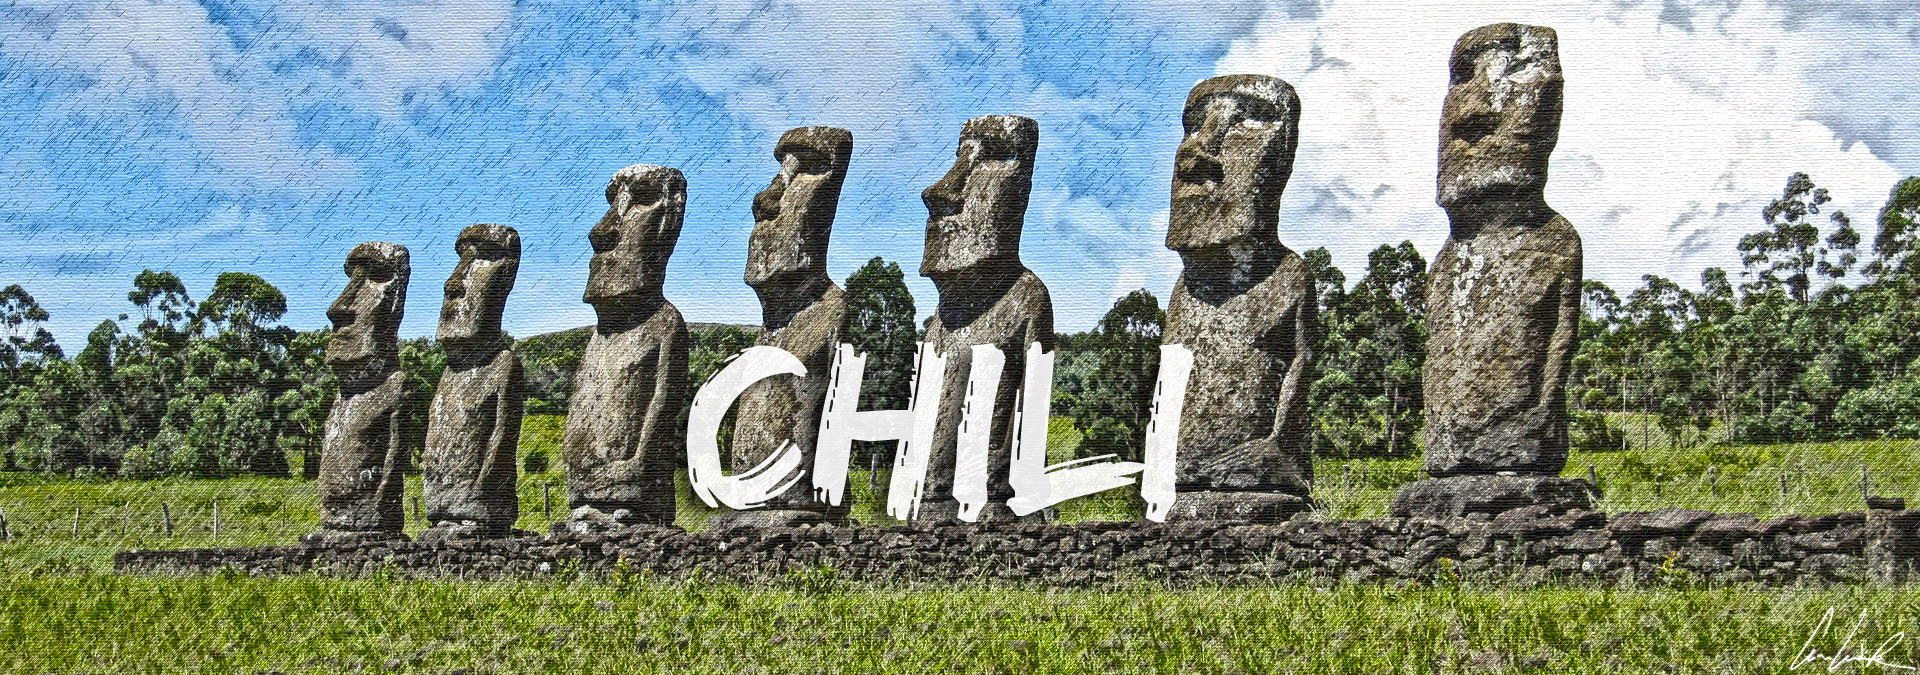 C-Ludik - Pays visité : Chili